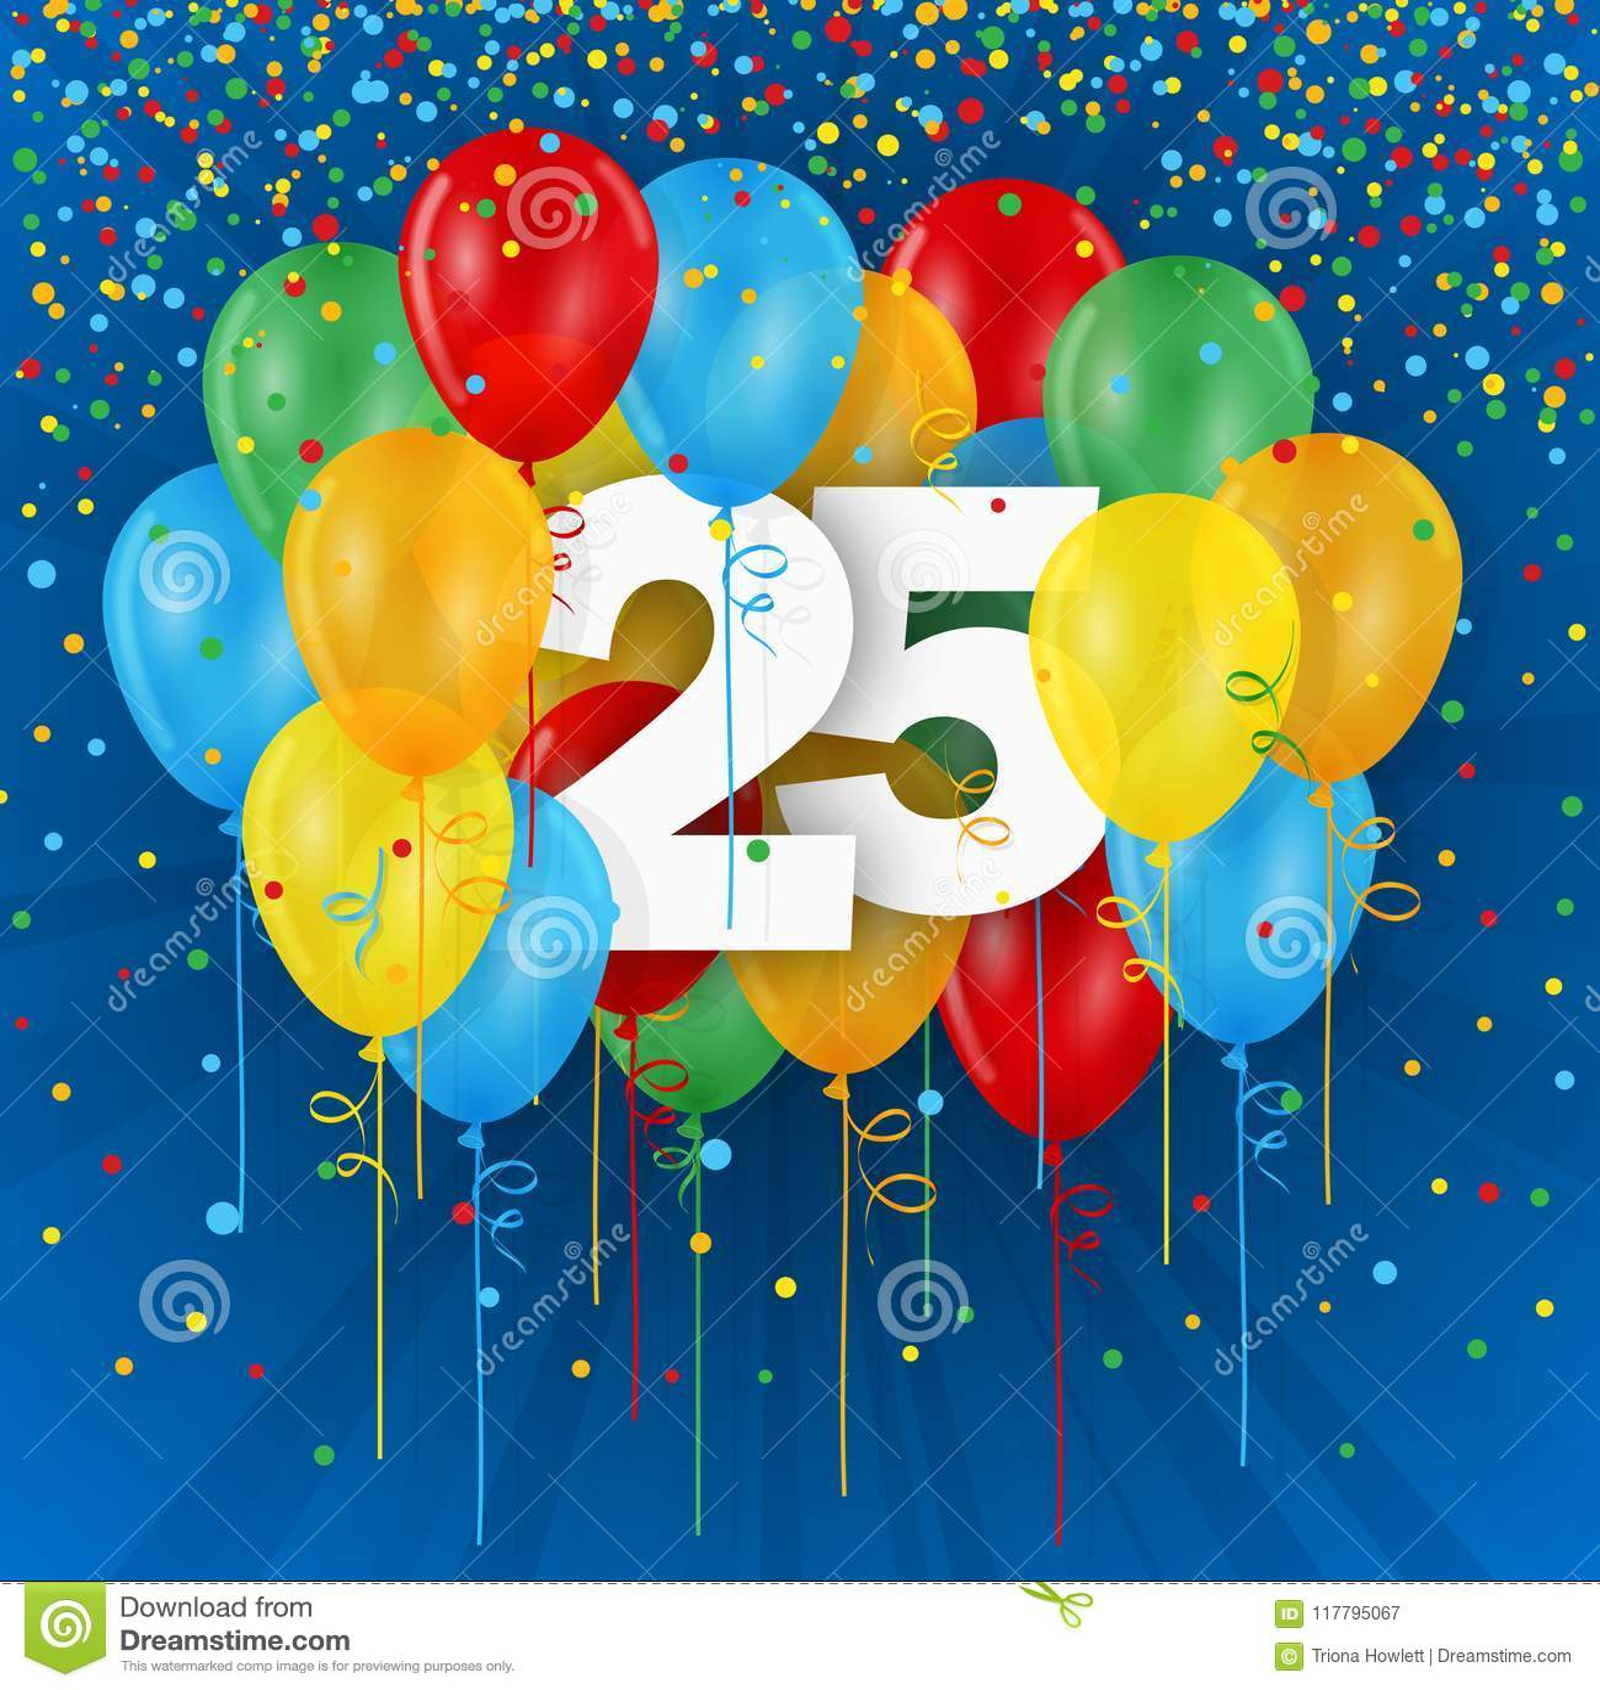 Happy 25th Birthday Anniversary Card With Balloons Stock Illustration Illustration Of Twentyfifth Balloons 117795067